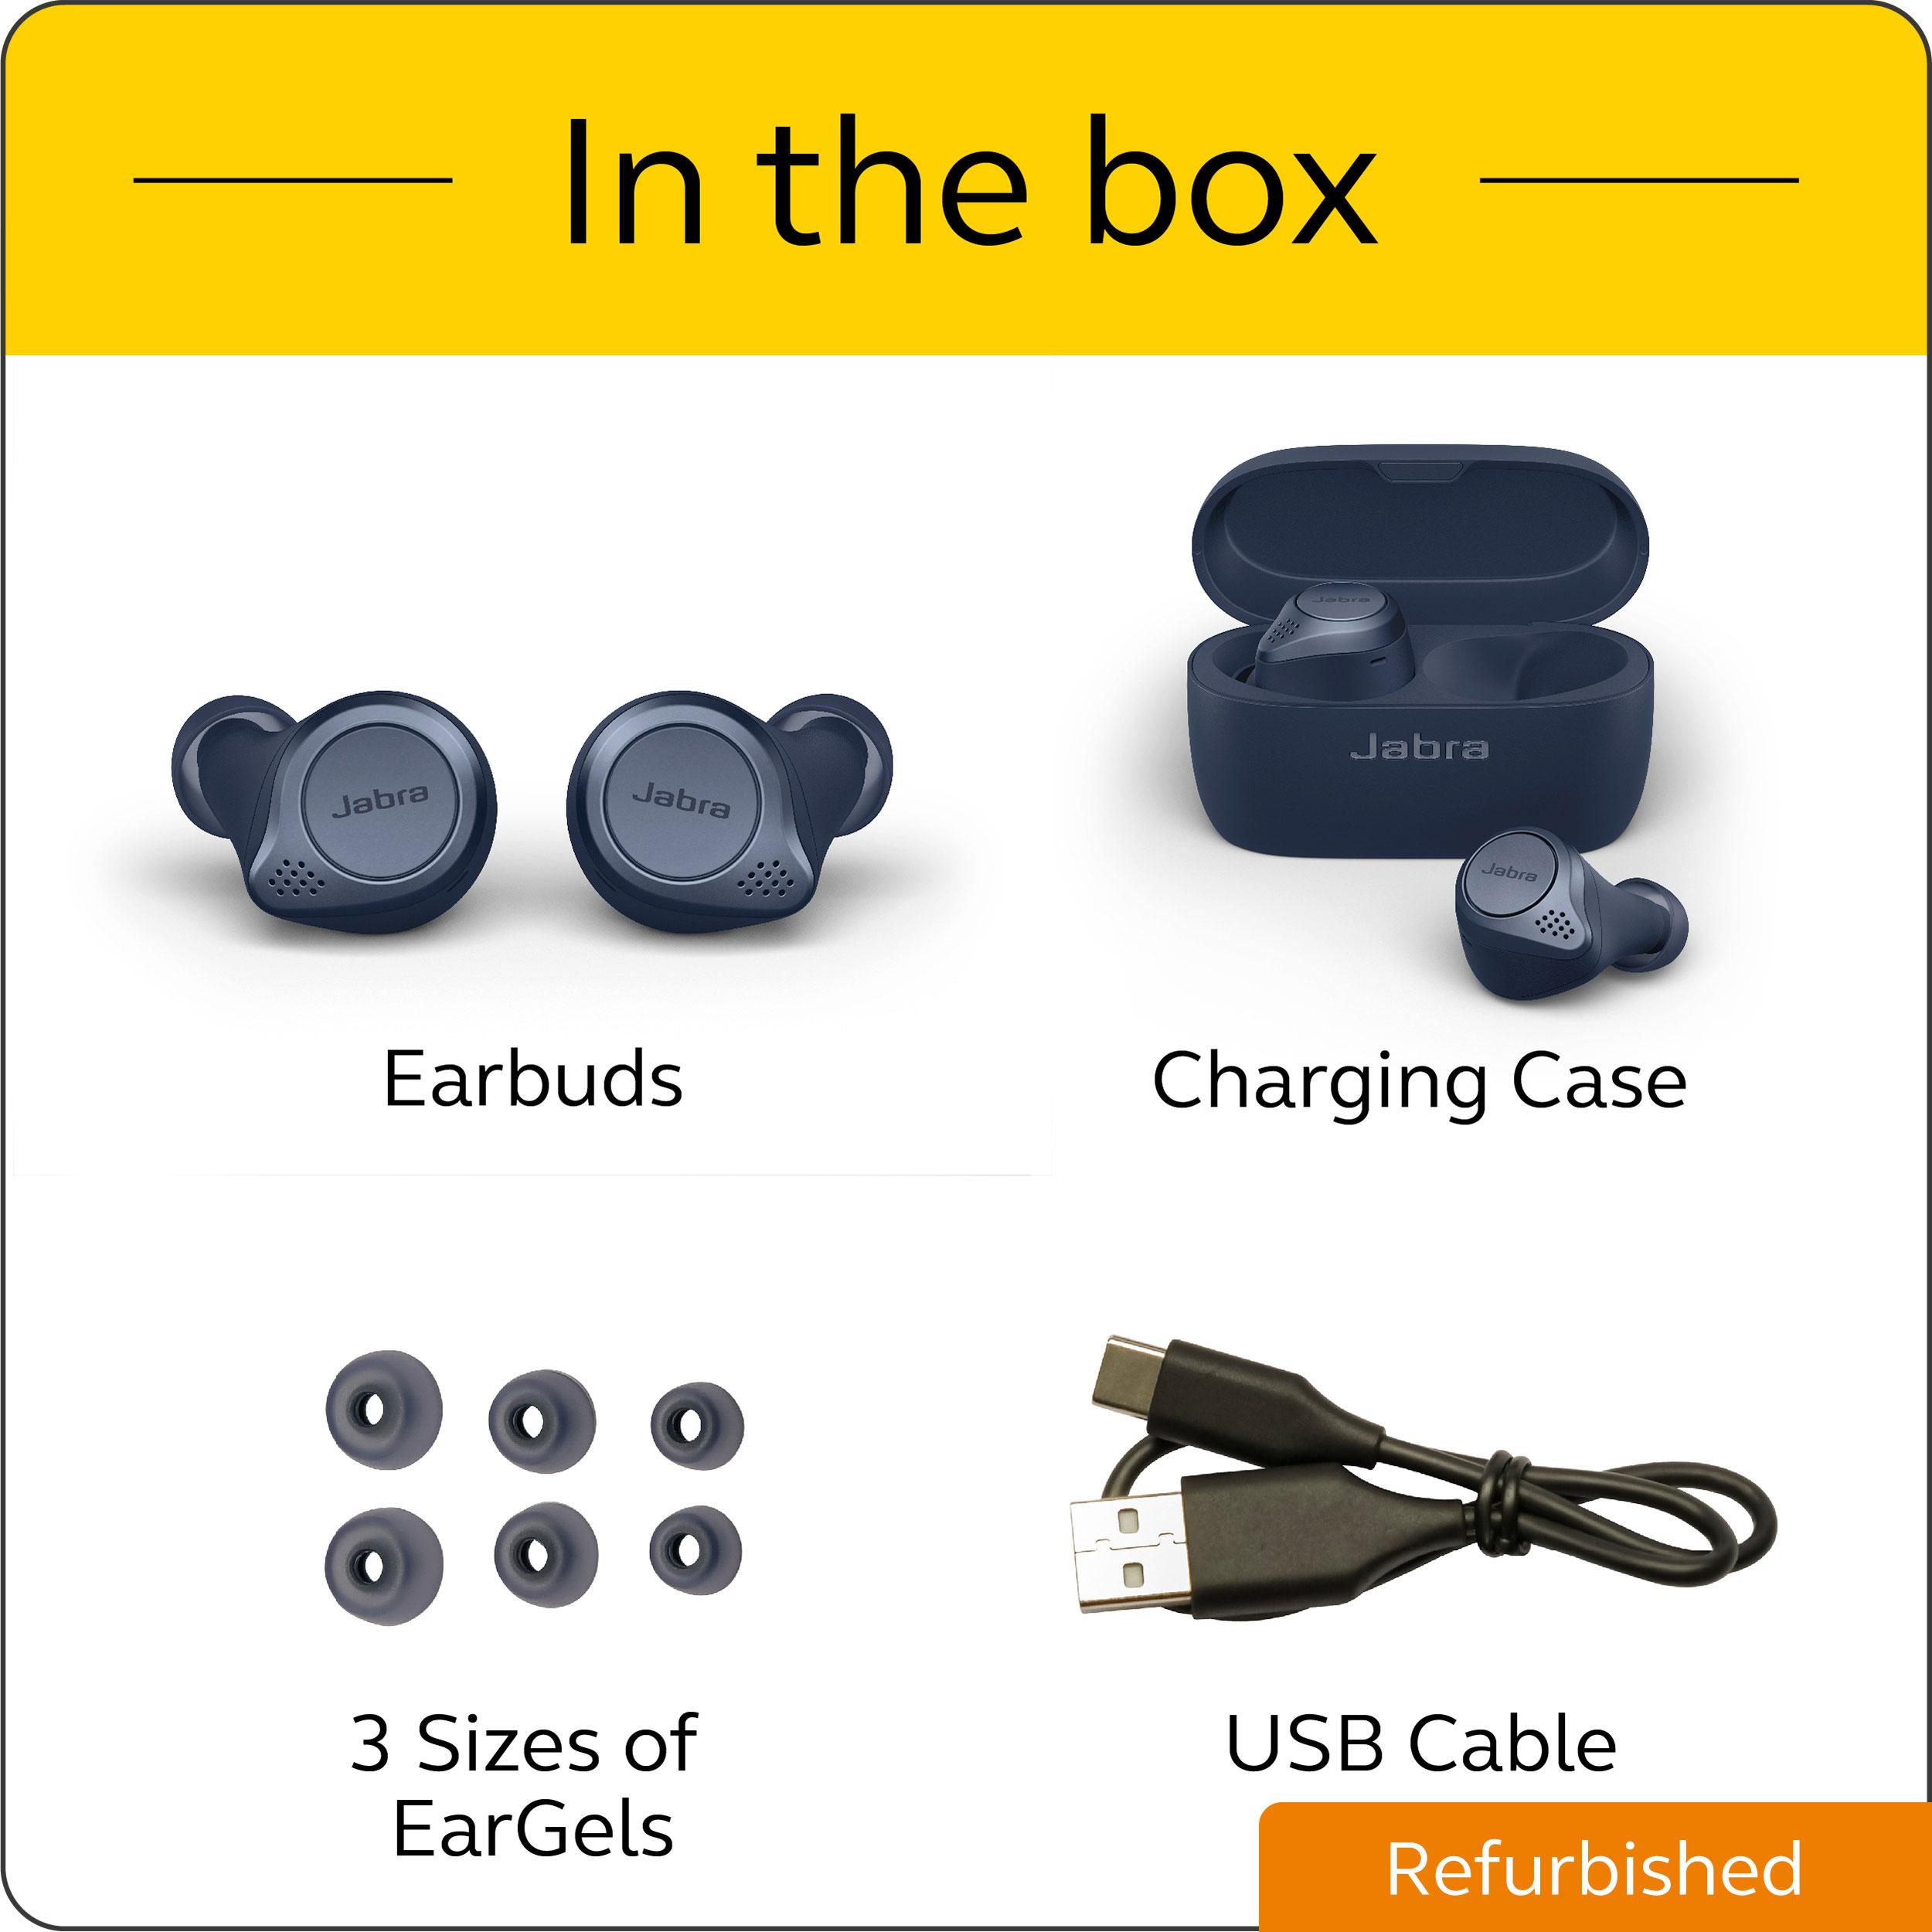 thumbnail 12 - Jabra Elite Active 75t True Wireless Earbuds Certified Refurbished